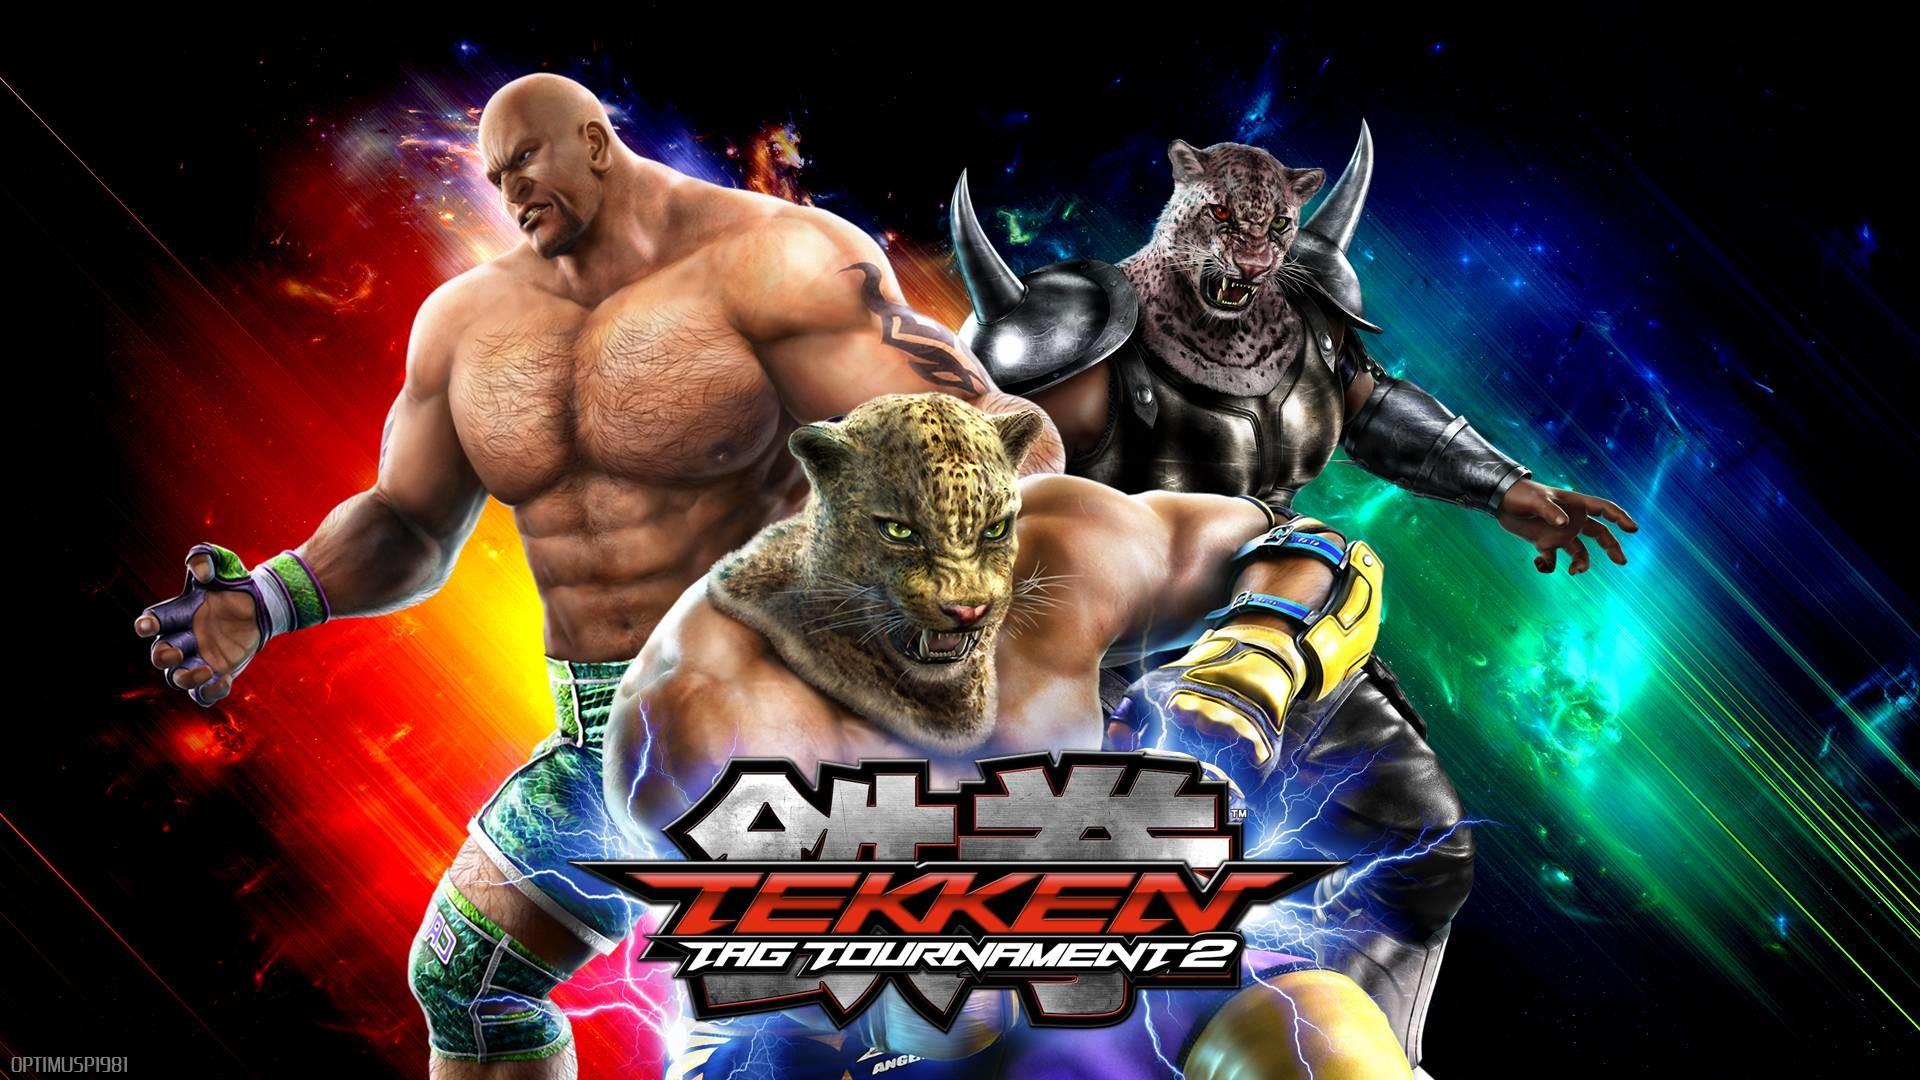 Tekken Tag 2 Wallpaper Hd Posted By Christopher Mercado